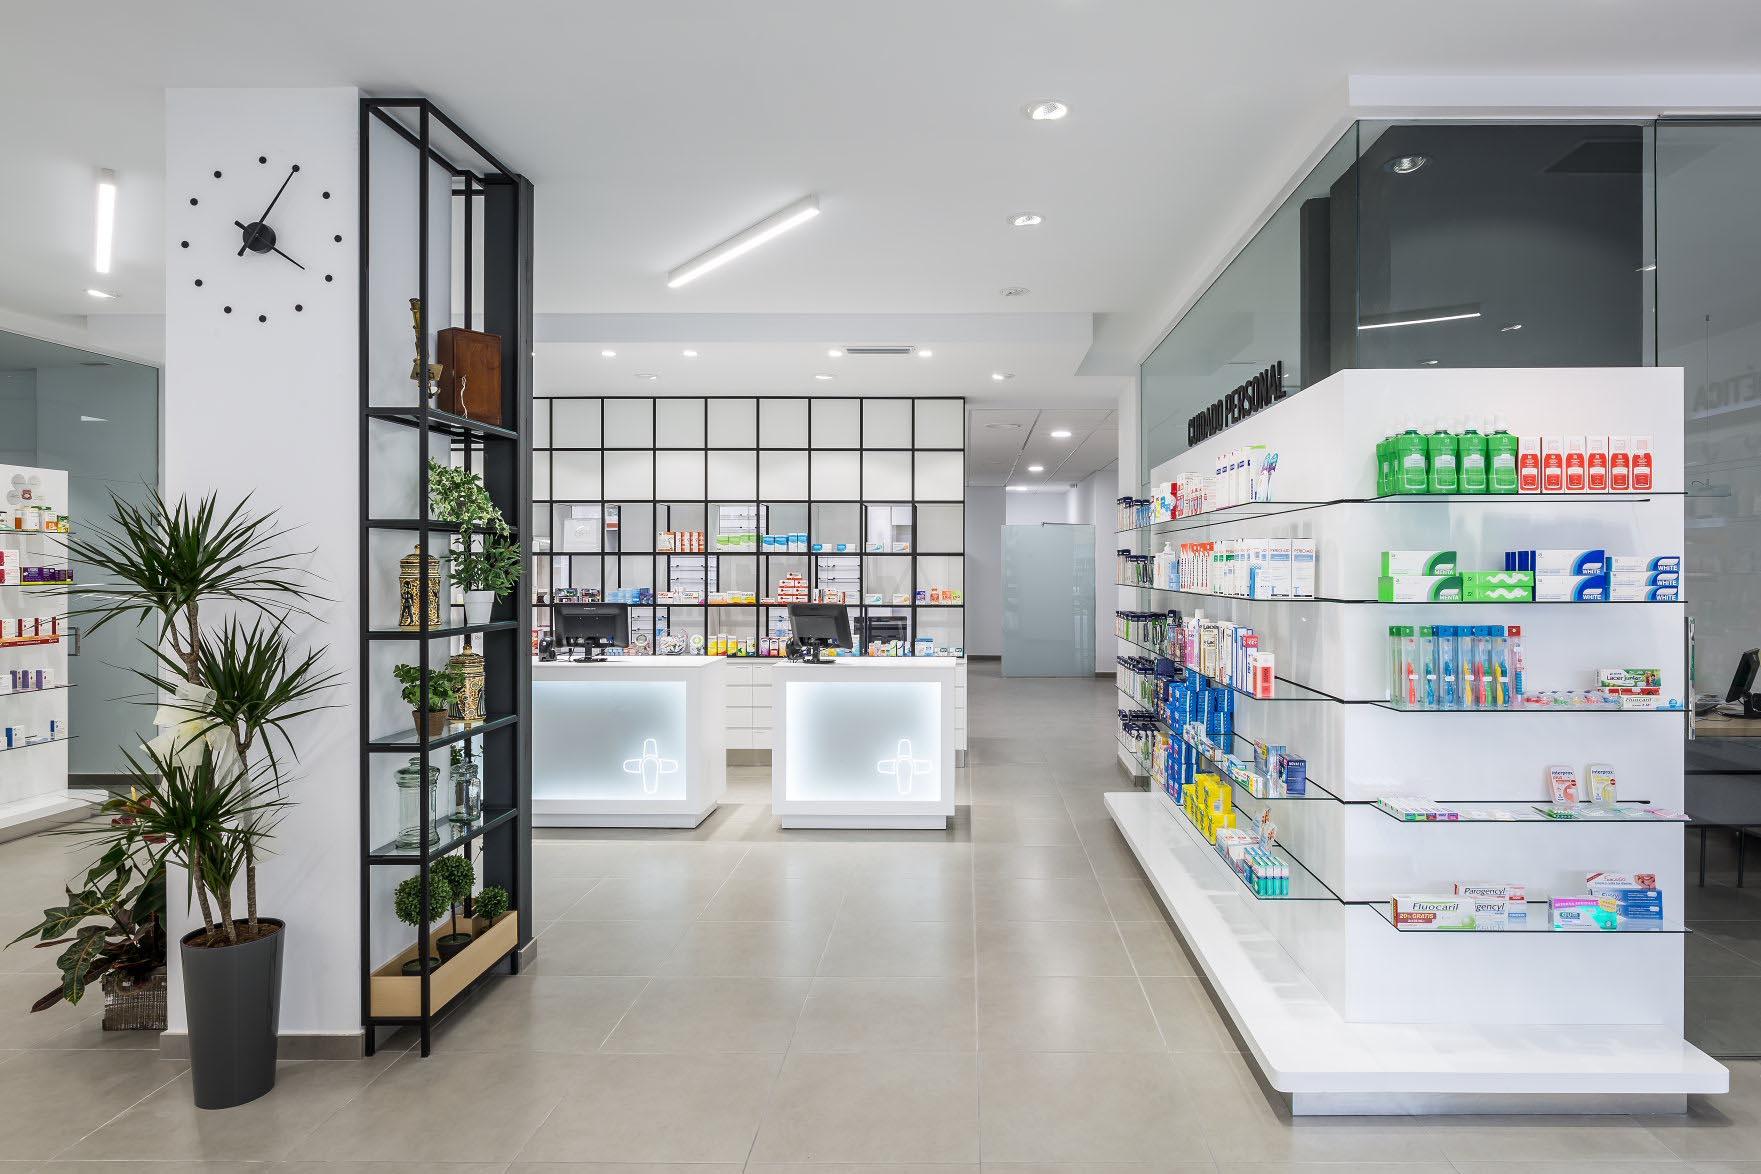 fotografia-arquitectura-valencia-german-cabo-d'estudio-farmacia-sud-picassent (x)_portada2